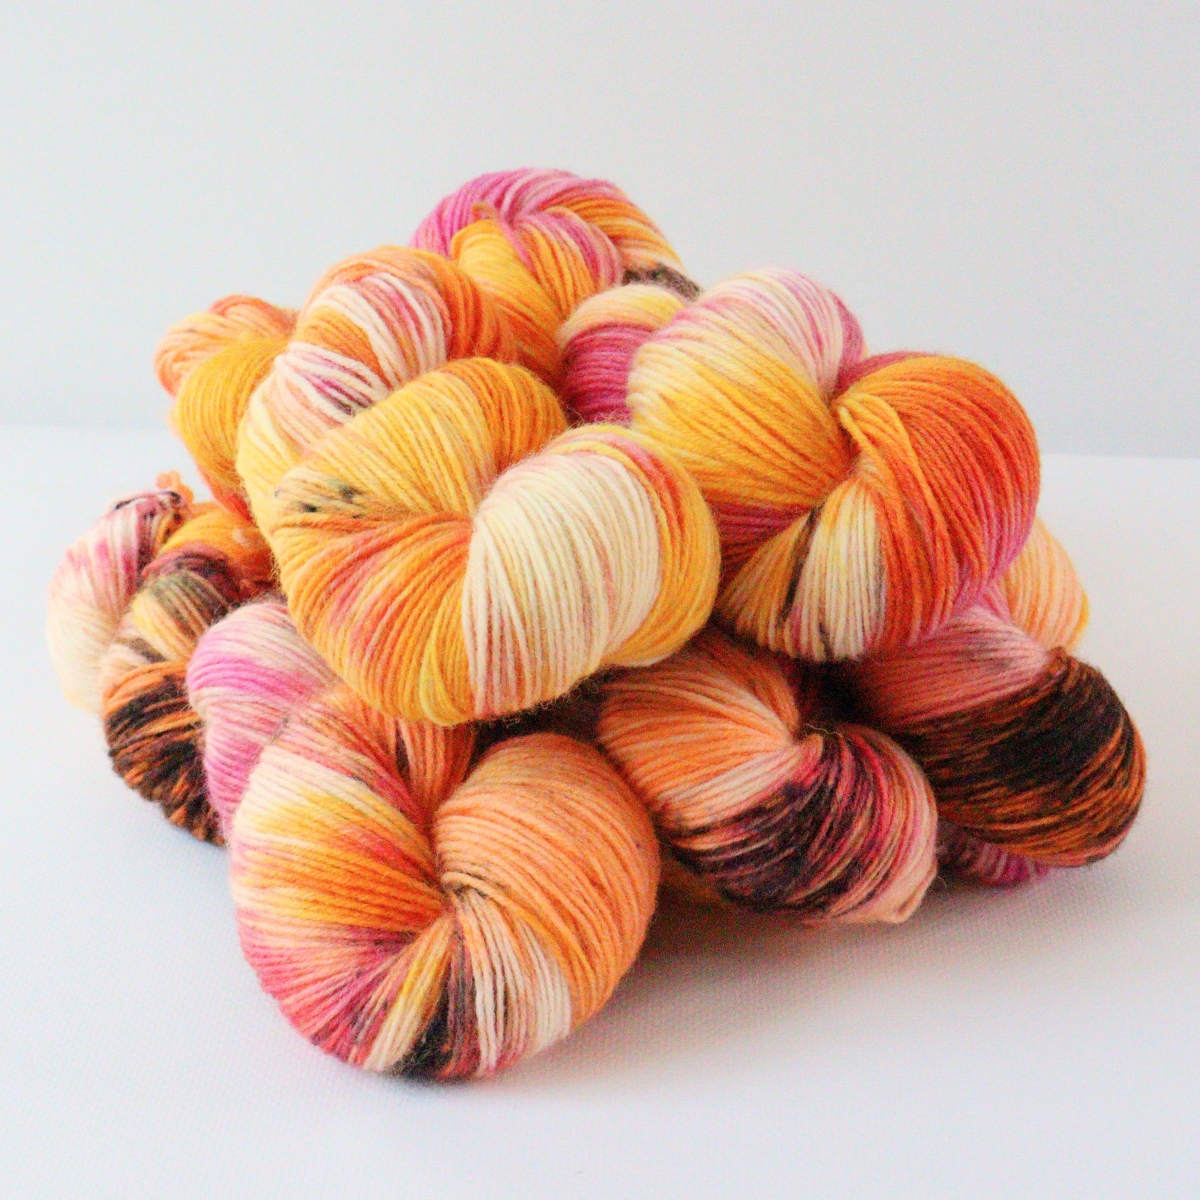 woodico.pro hand dyed yarn 083 1 1200x1200 - Hand dyed yarn / 083